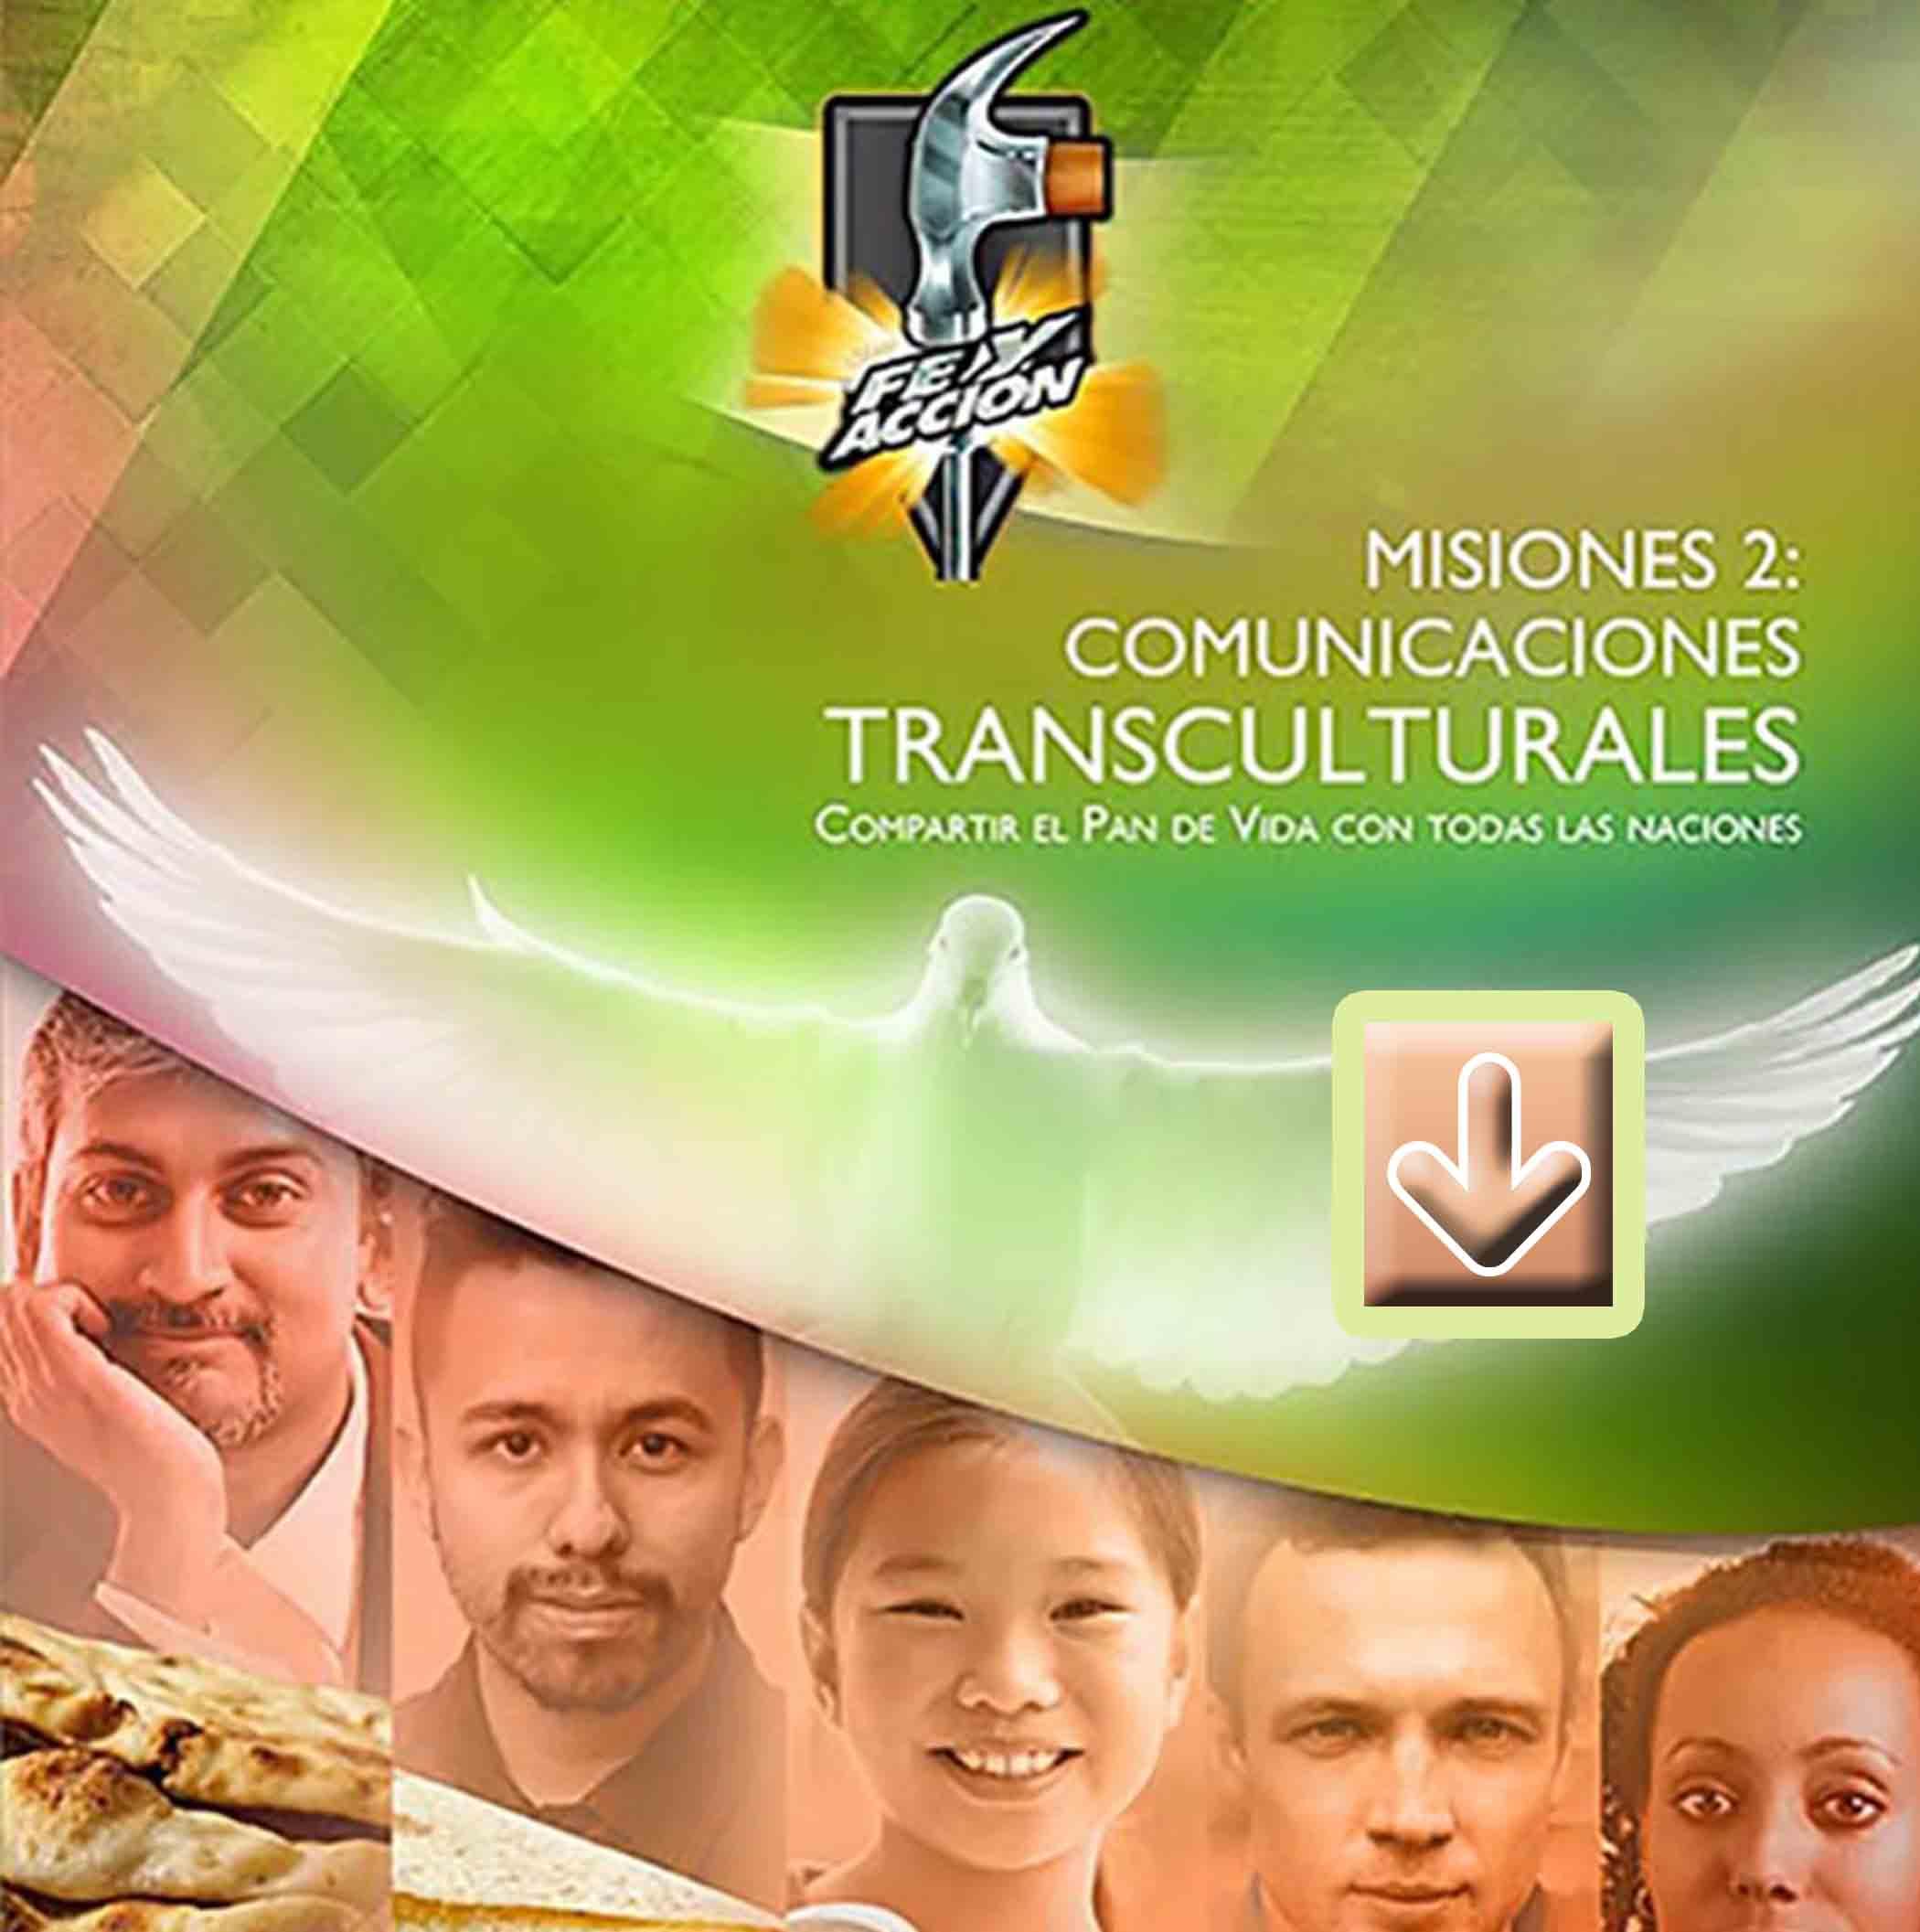 Comunicaciones Transculturales: Misiones 2 - Archivo comprimido eVisuales - 4441-31SX